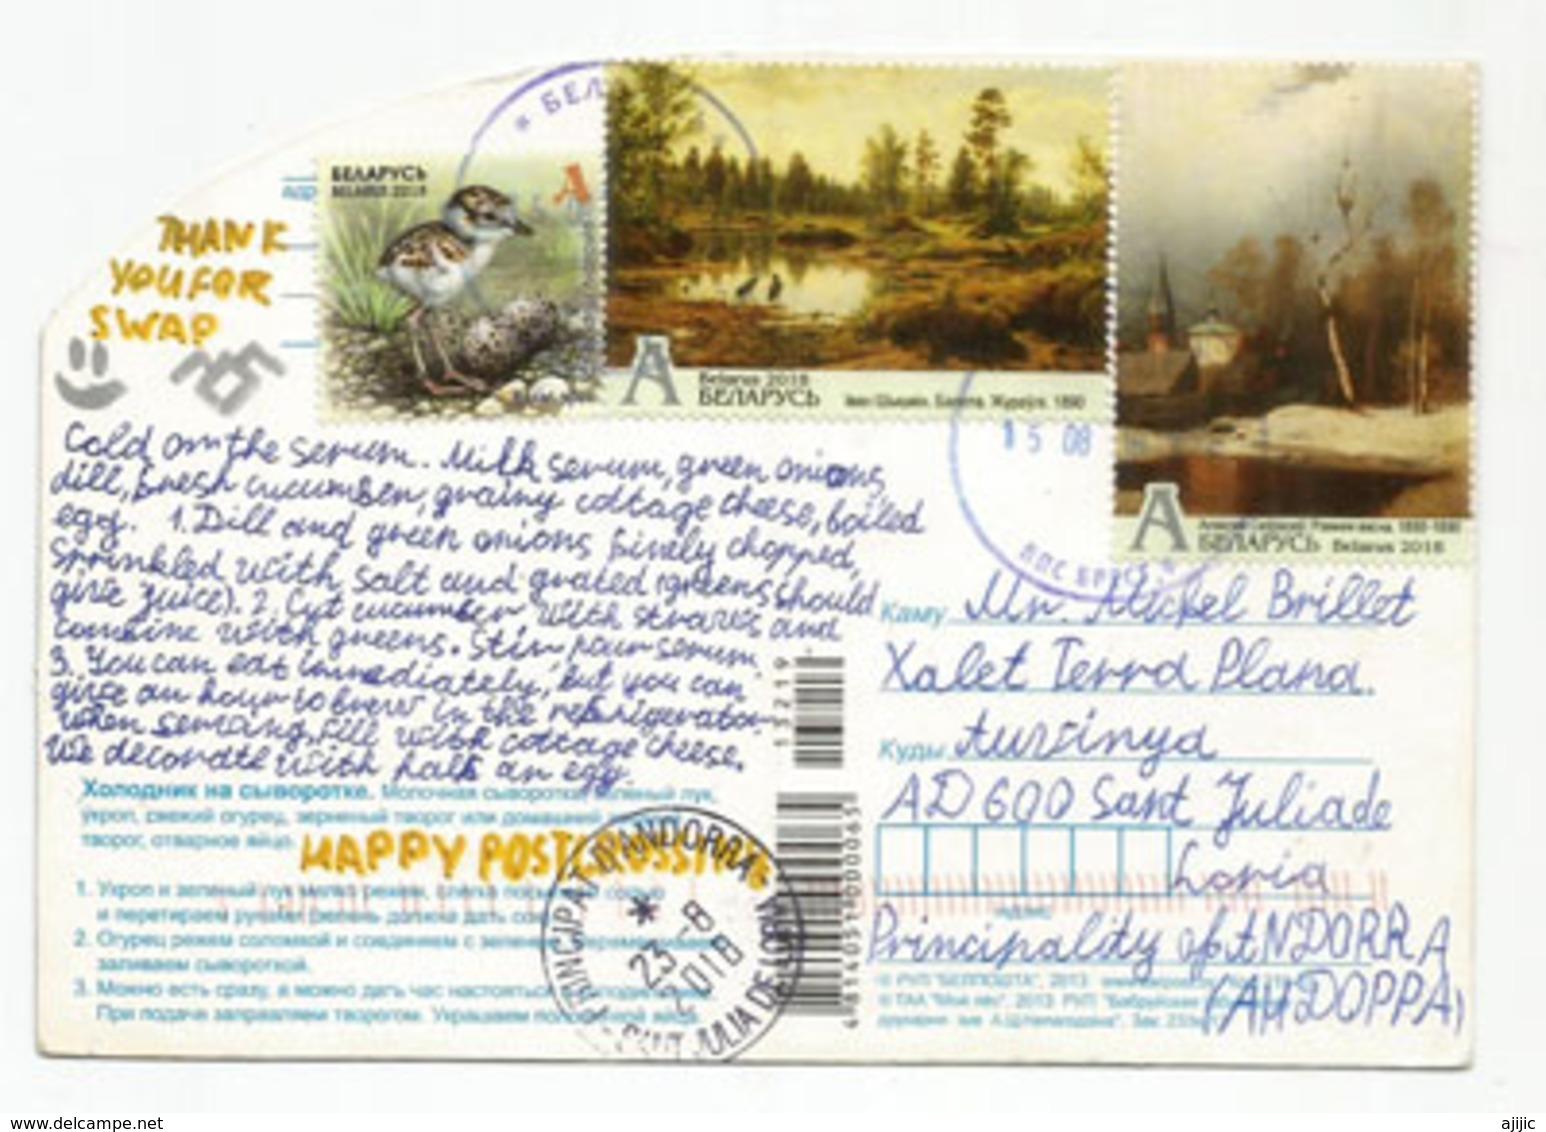 Soupe Au Lait De Biélorussie, Belle Carte Postale Adressée Andorra, Avec Timbre à Date Arrivée - Belarus